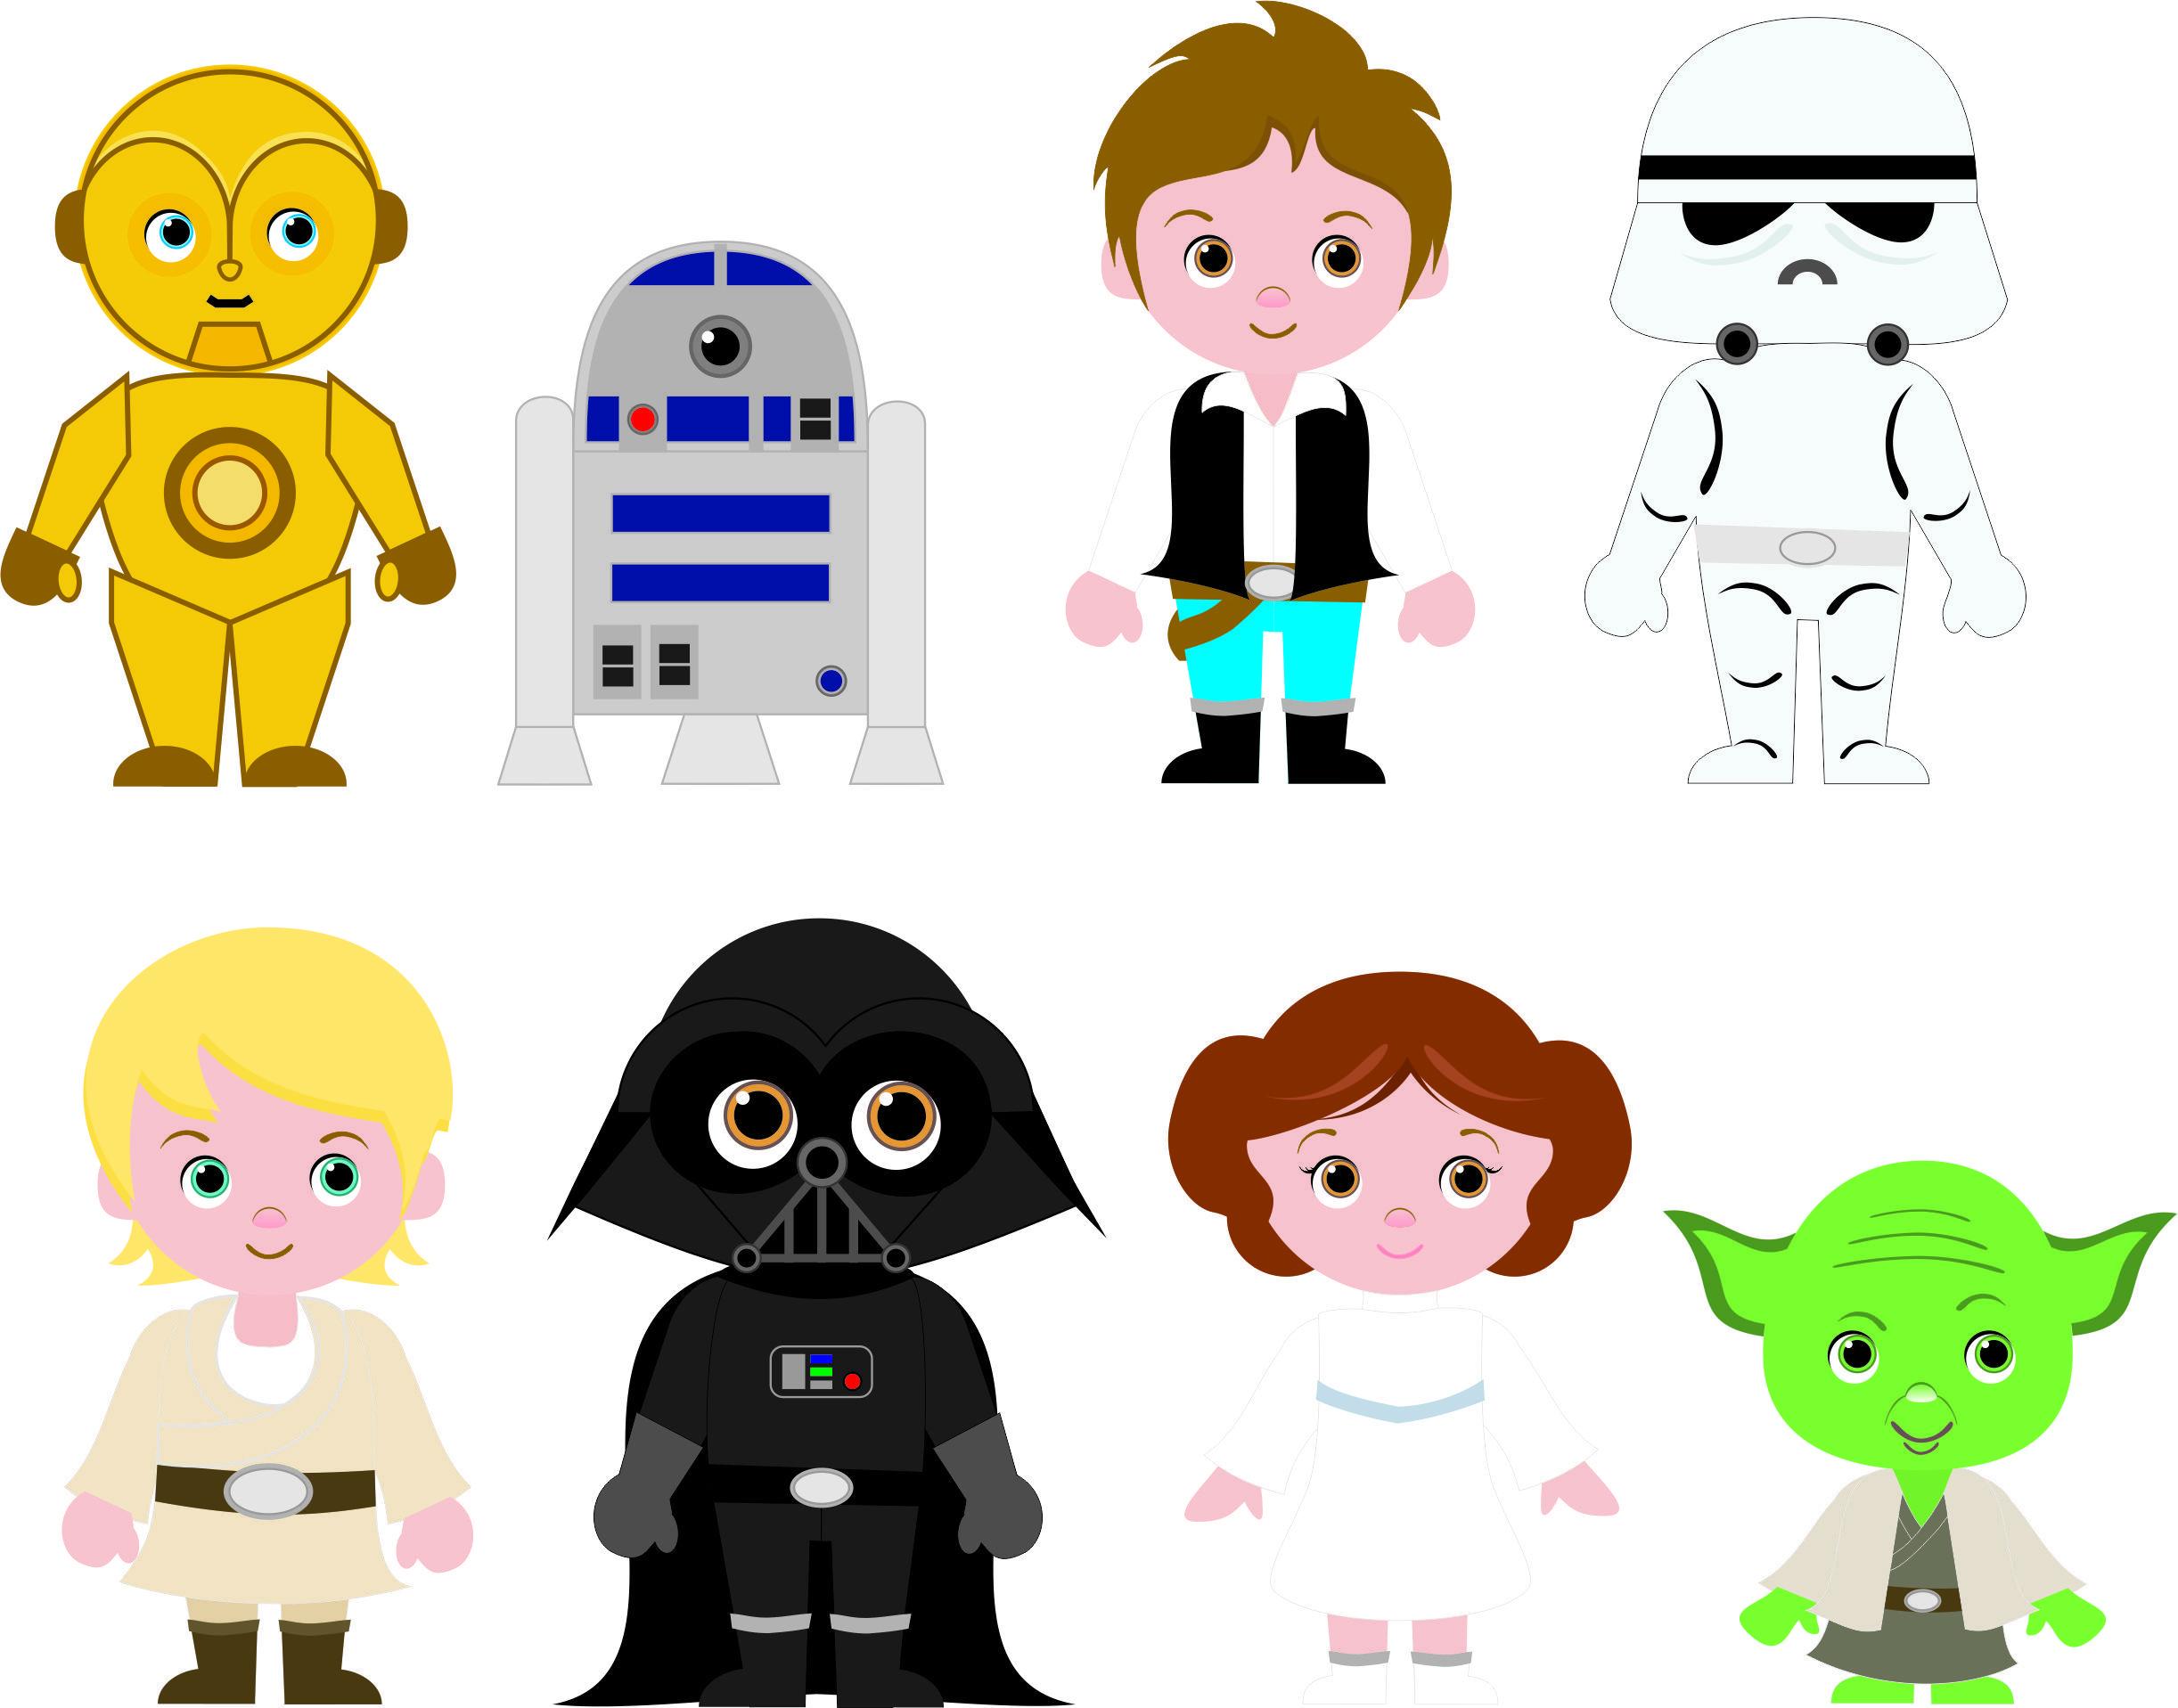 Cliparts Fofinhos Para Festa Star Wars Cute Cliparts For Star Wars Party